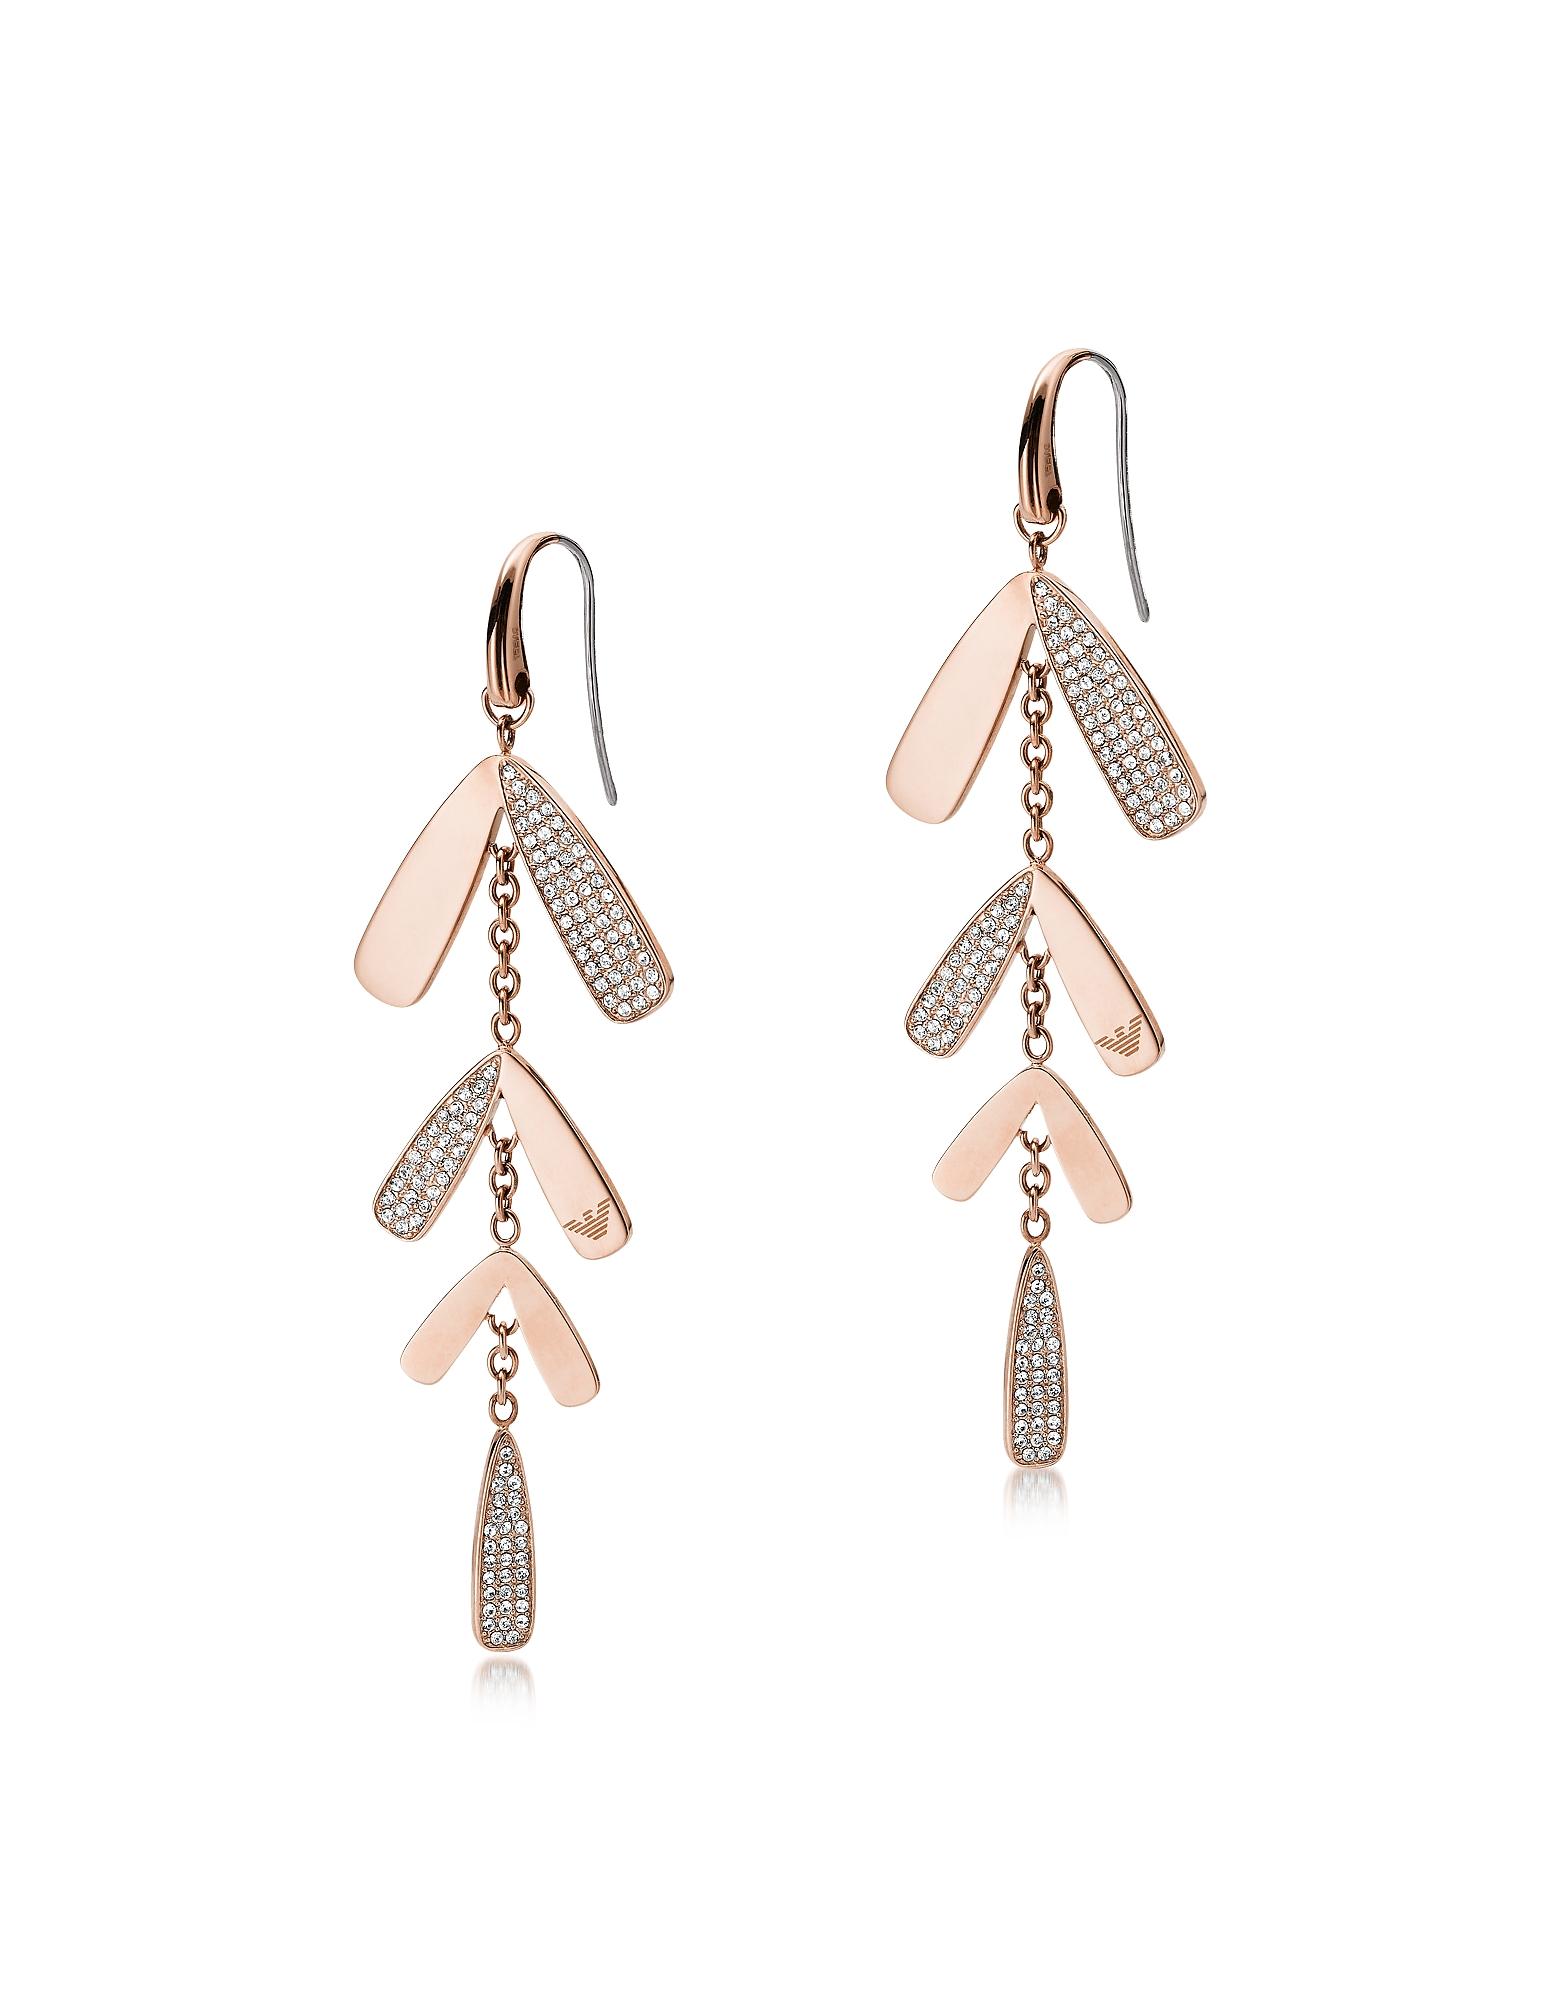 Abstract Leaves Drop Earrings